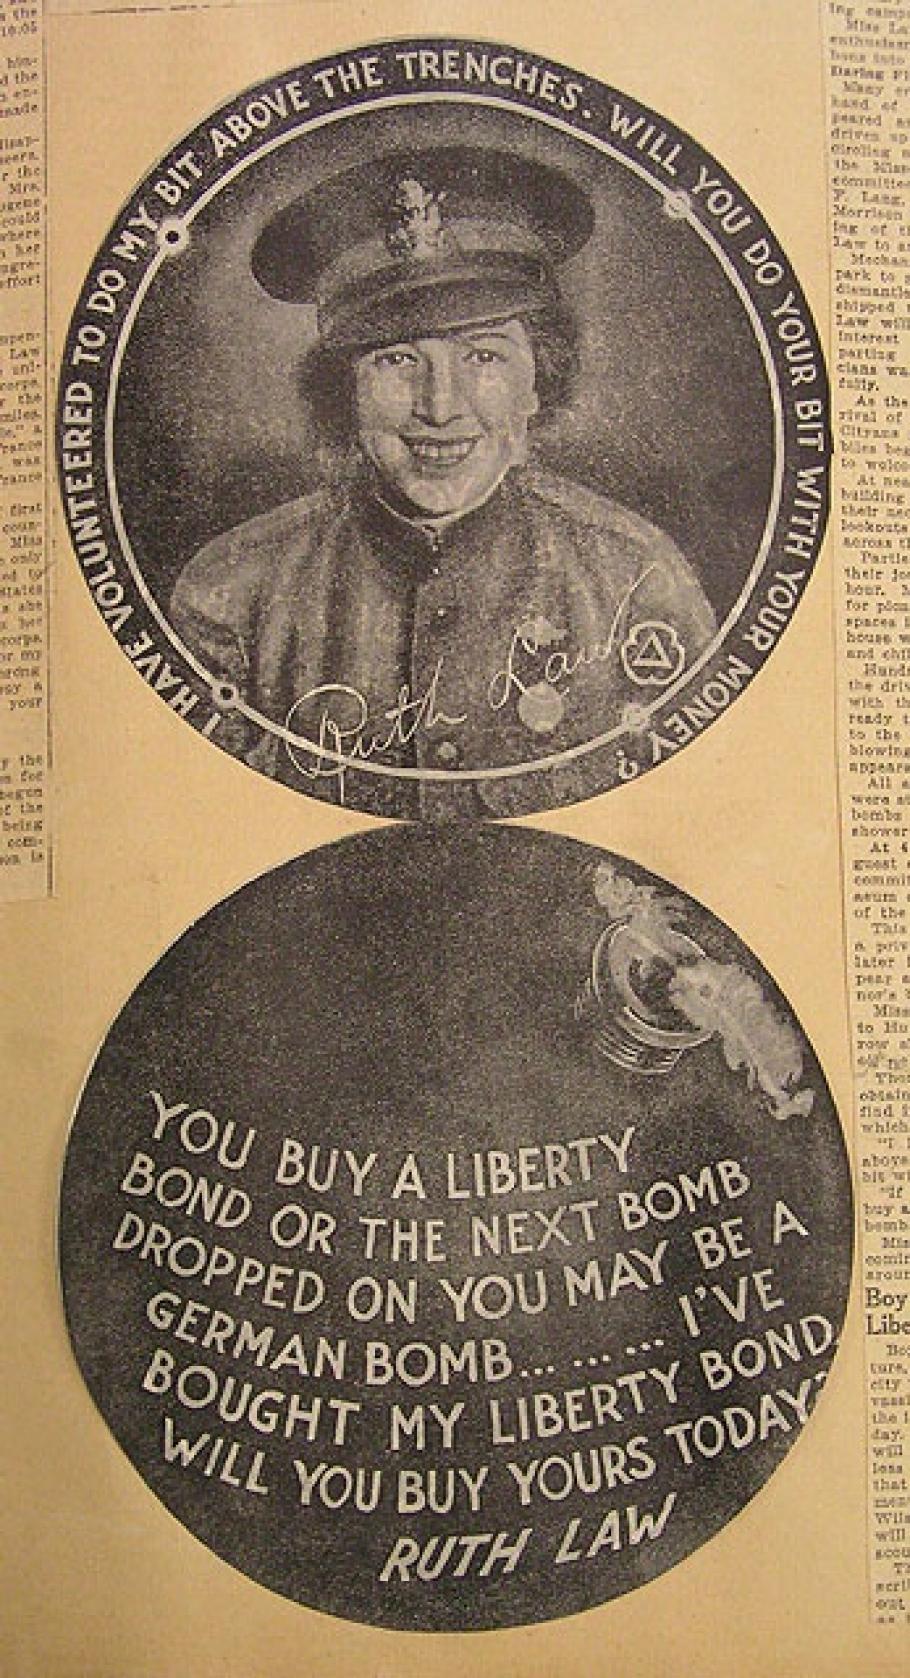 Ruth Law Liberty Bond